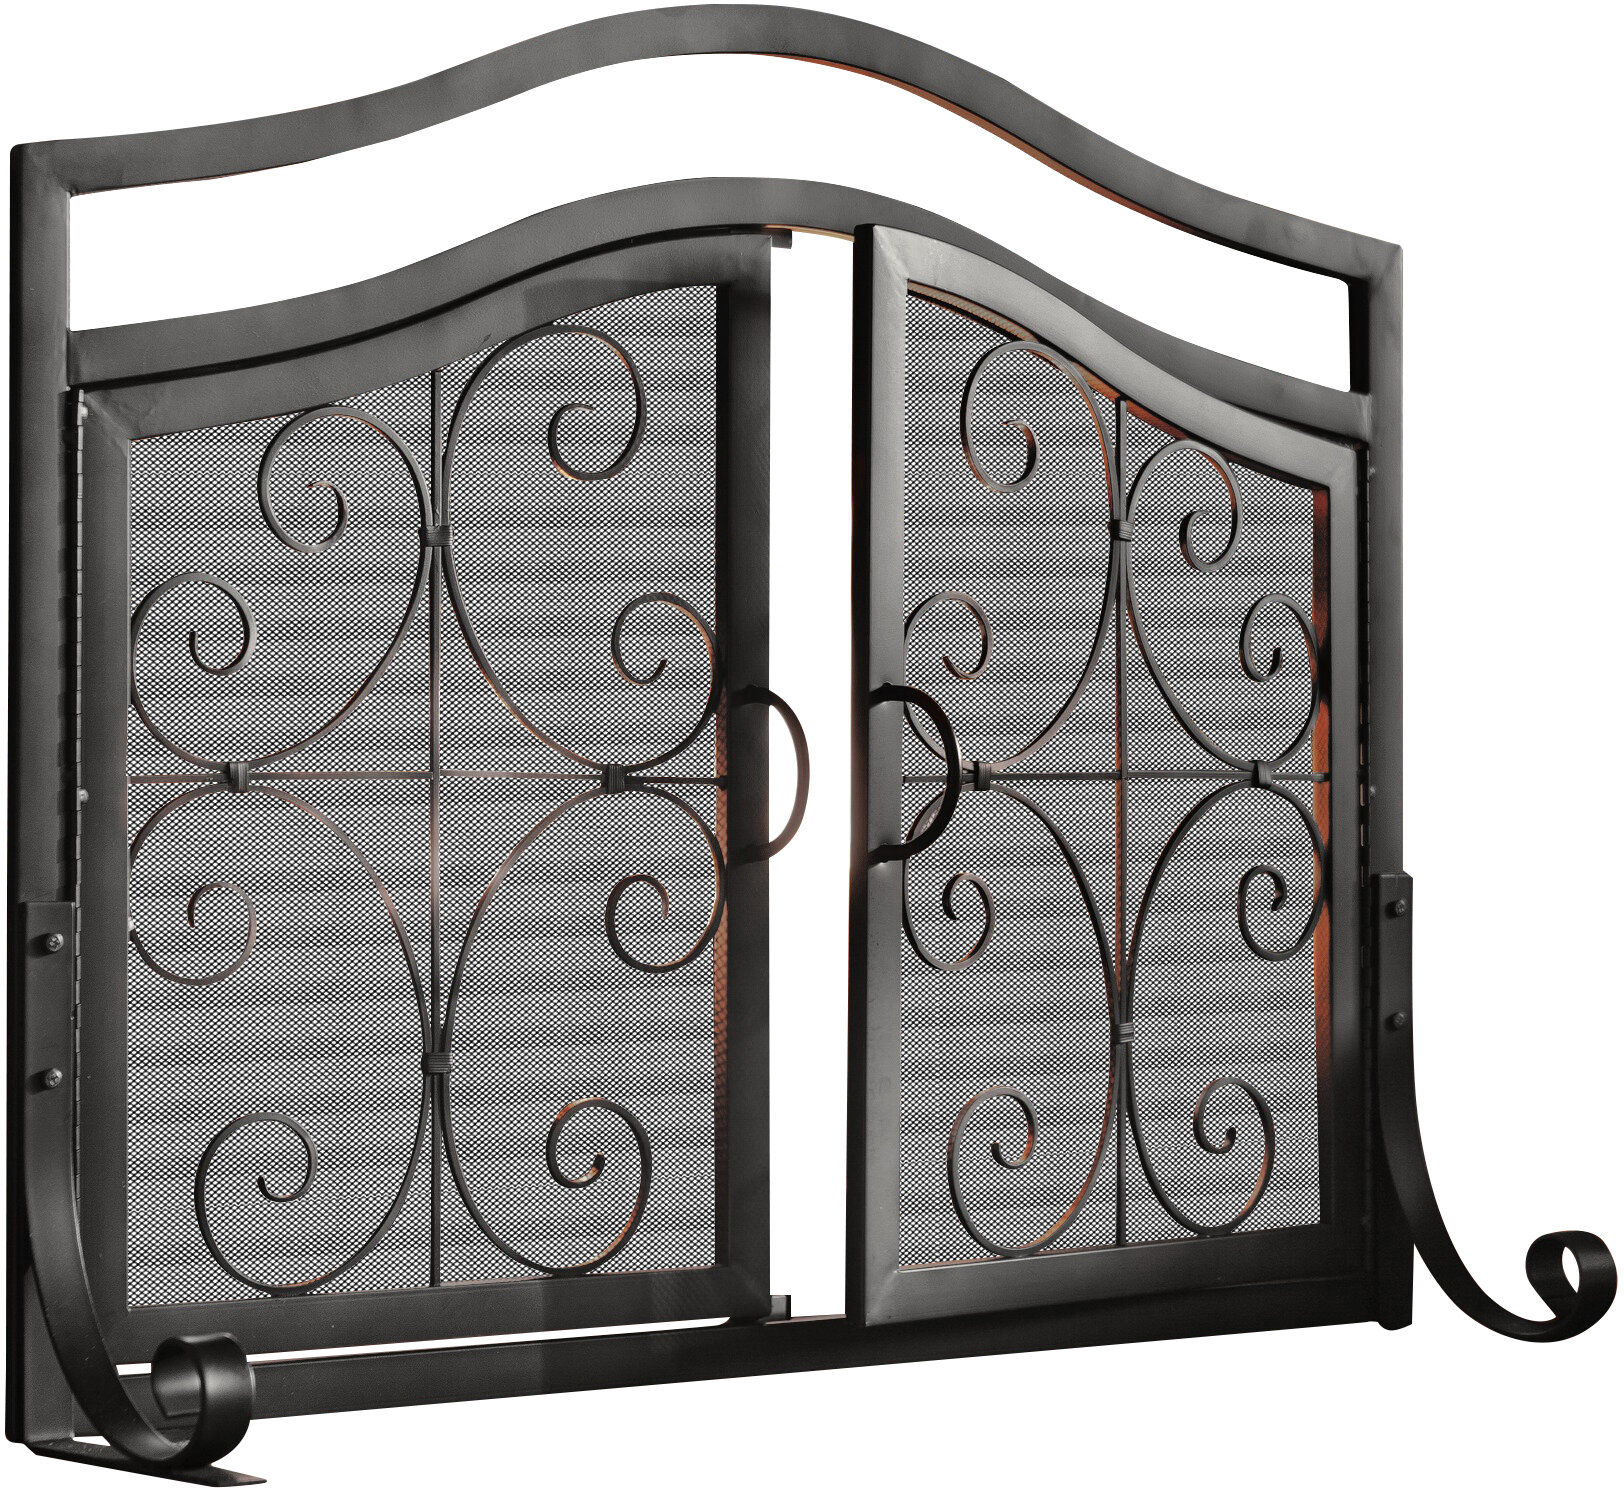 Plow \u0026 Hearth Small Crest Iron Fireplace Screen with Doors \u0026 Reviews   Wayfair  sc 1 st  Wayfair & Plow \u0026 Hearth Small Crest Iron Fireplace Screen with Doors \u0026 Reviews ...